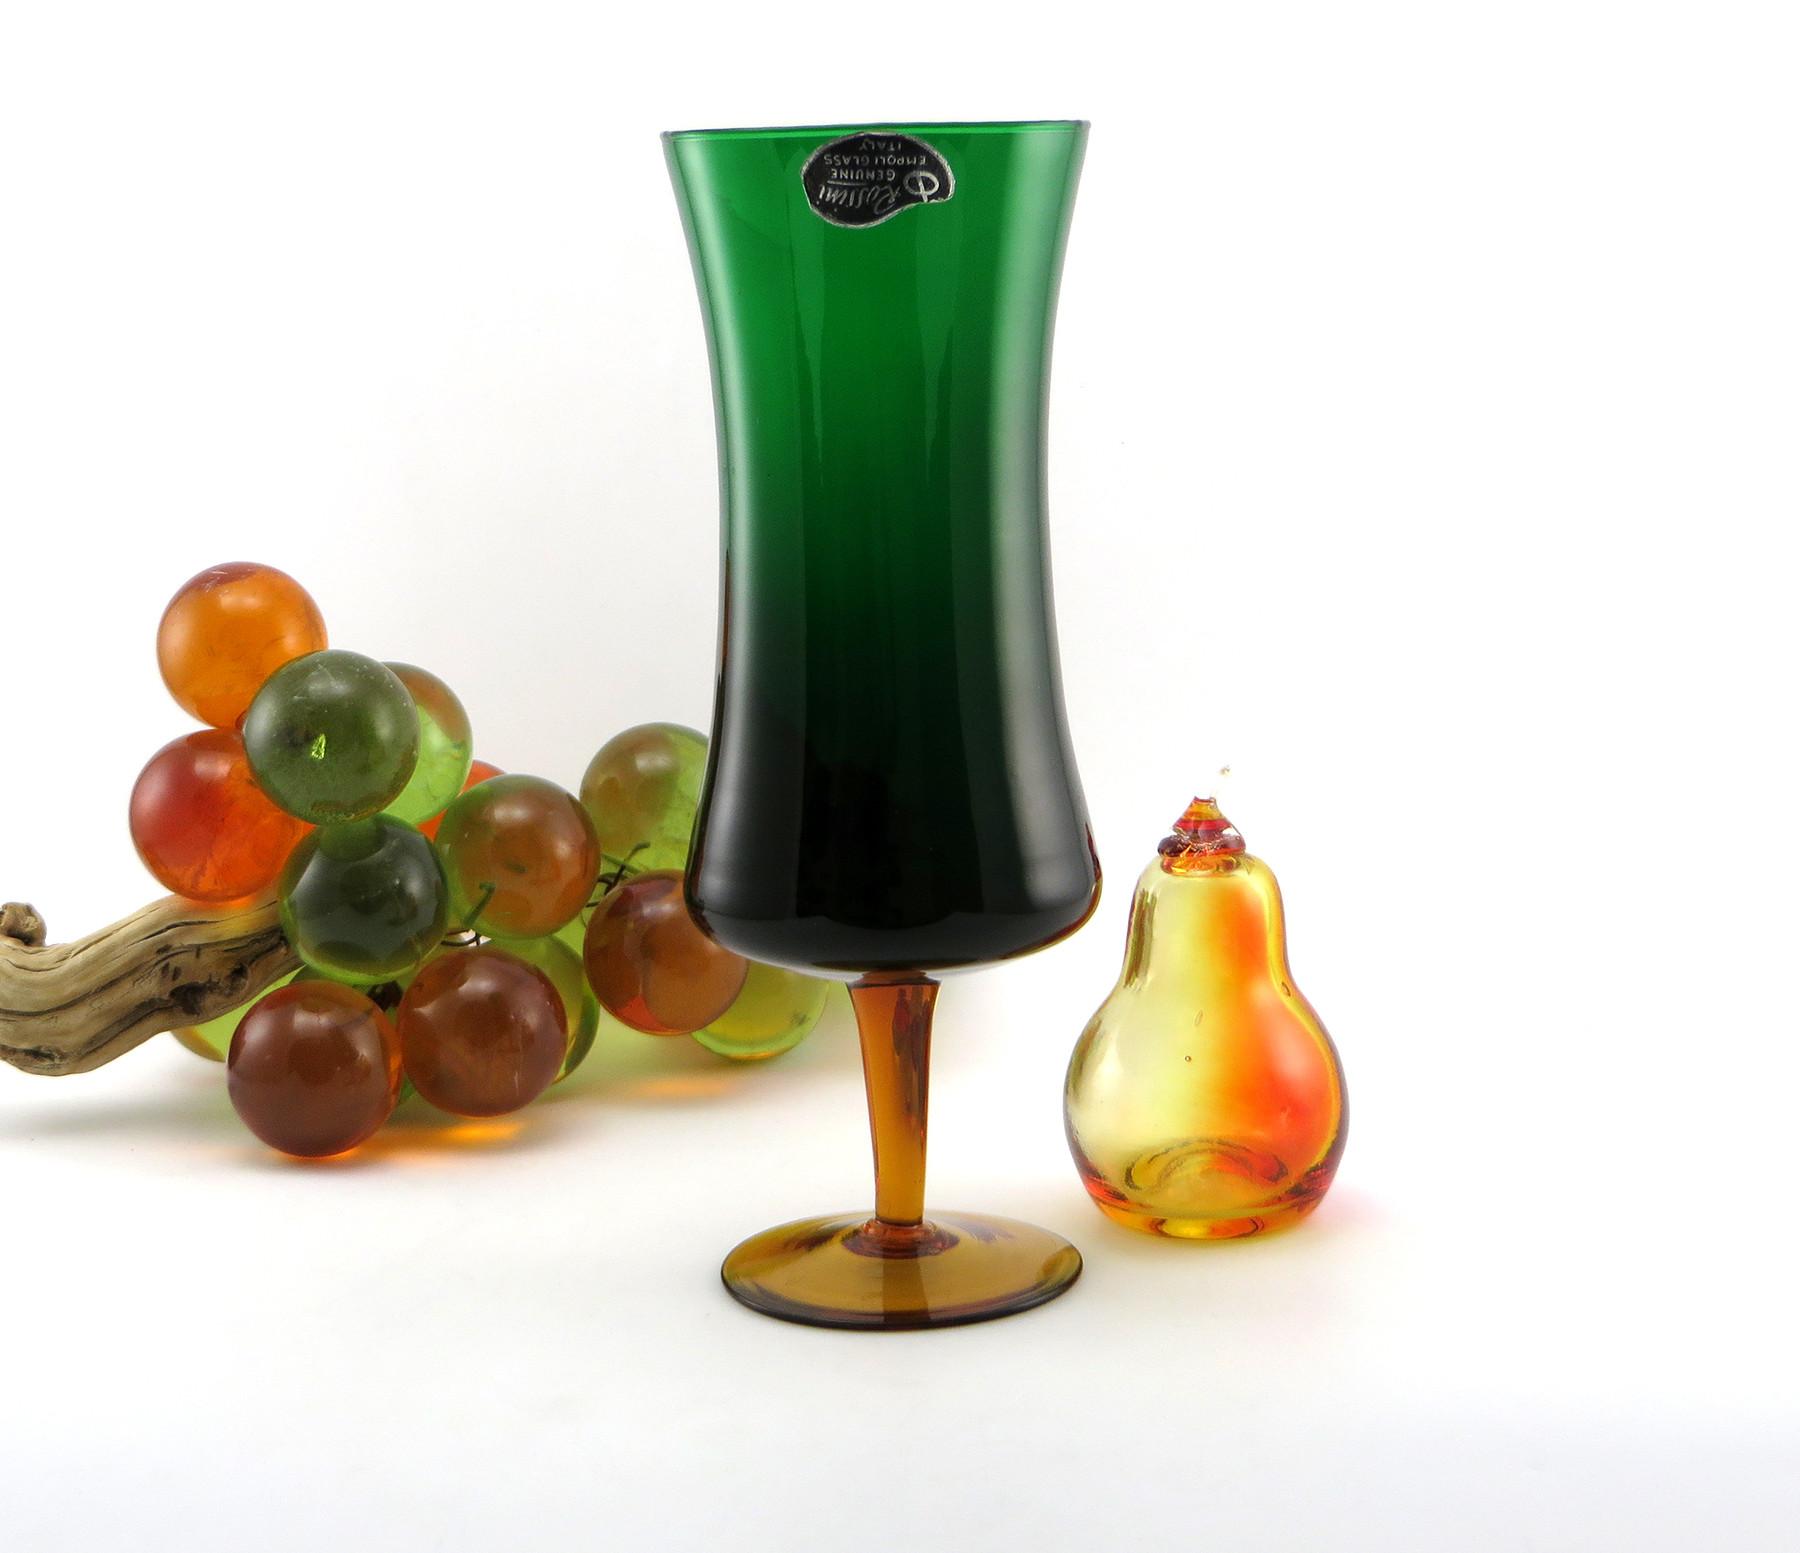 vintage murano glass vase of rossini empoli art glass retro modern vase with label retro art glass regarding rossini empoli art glass retro modern vase with label